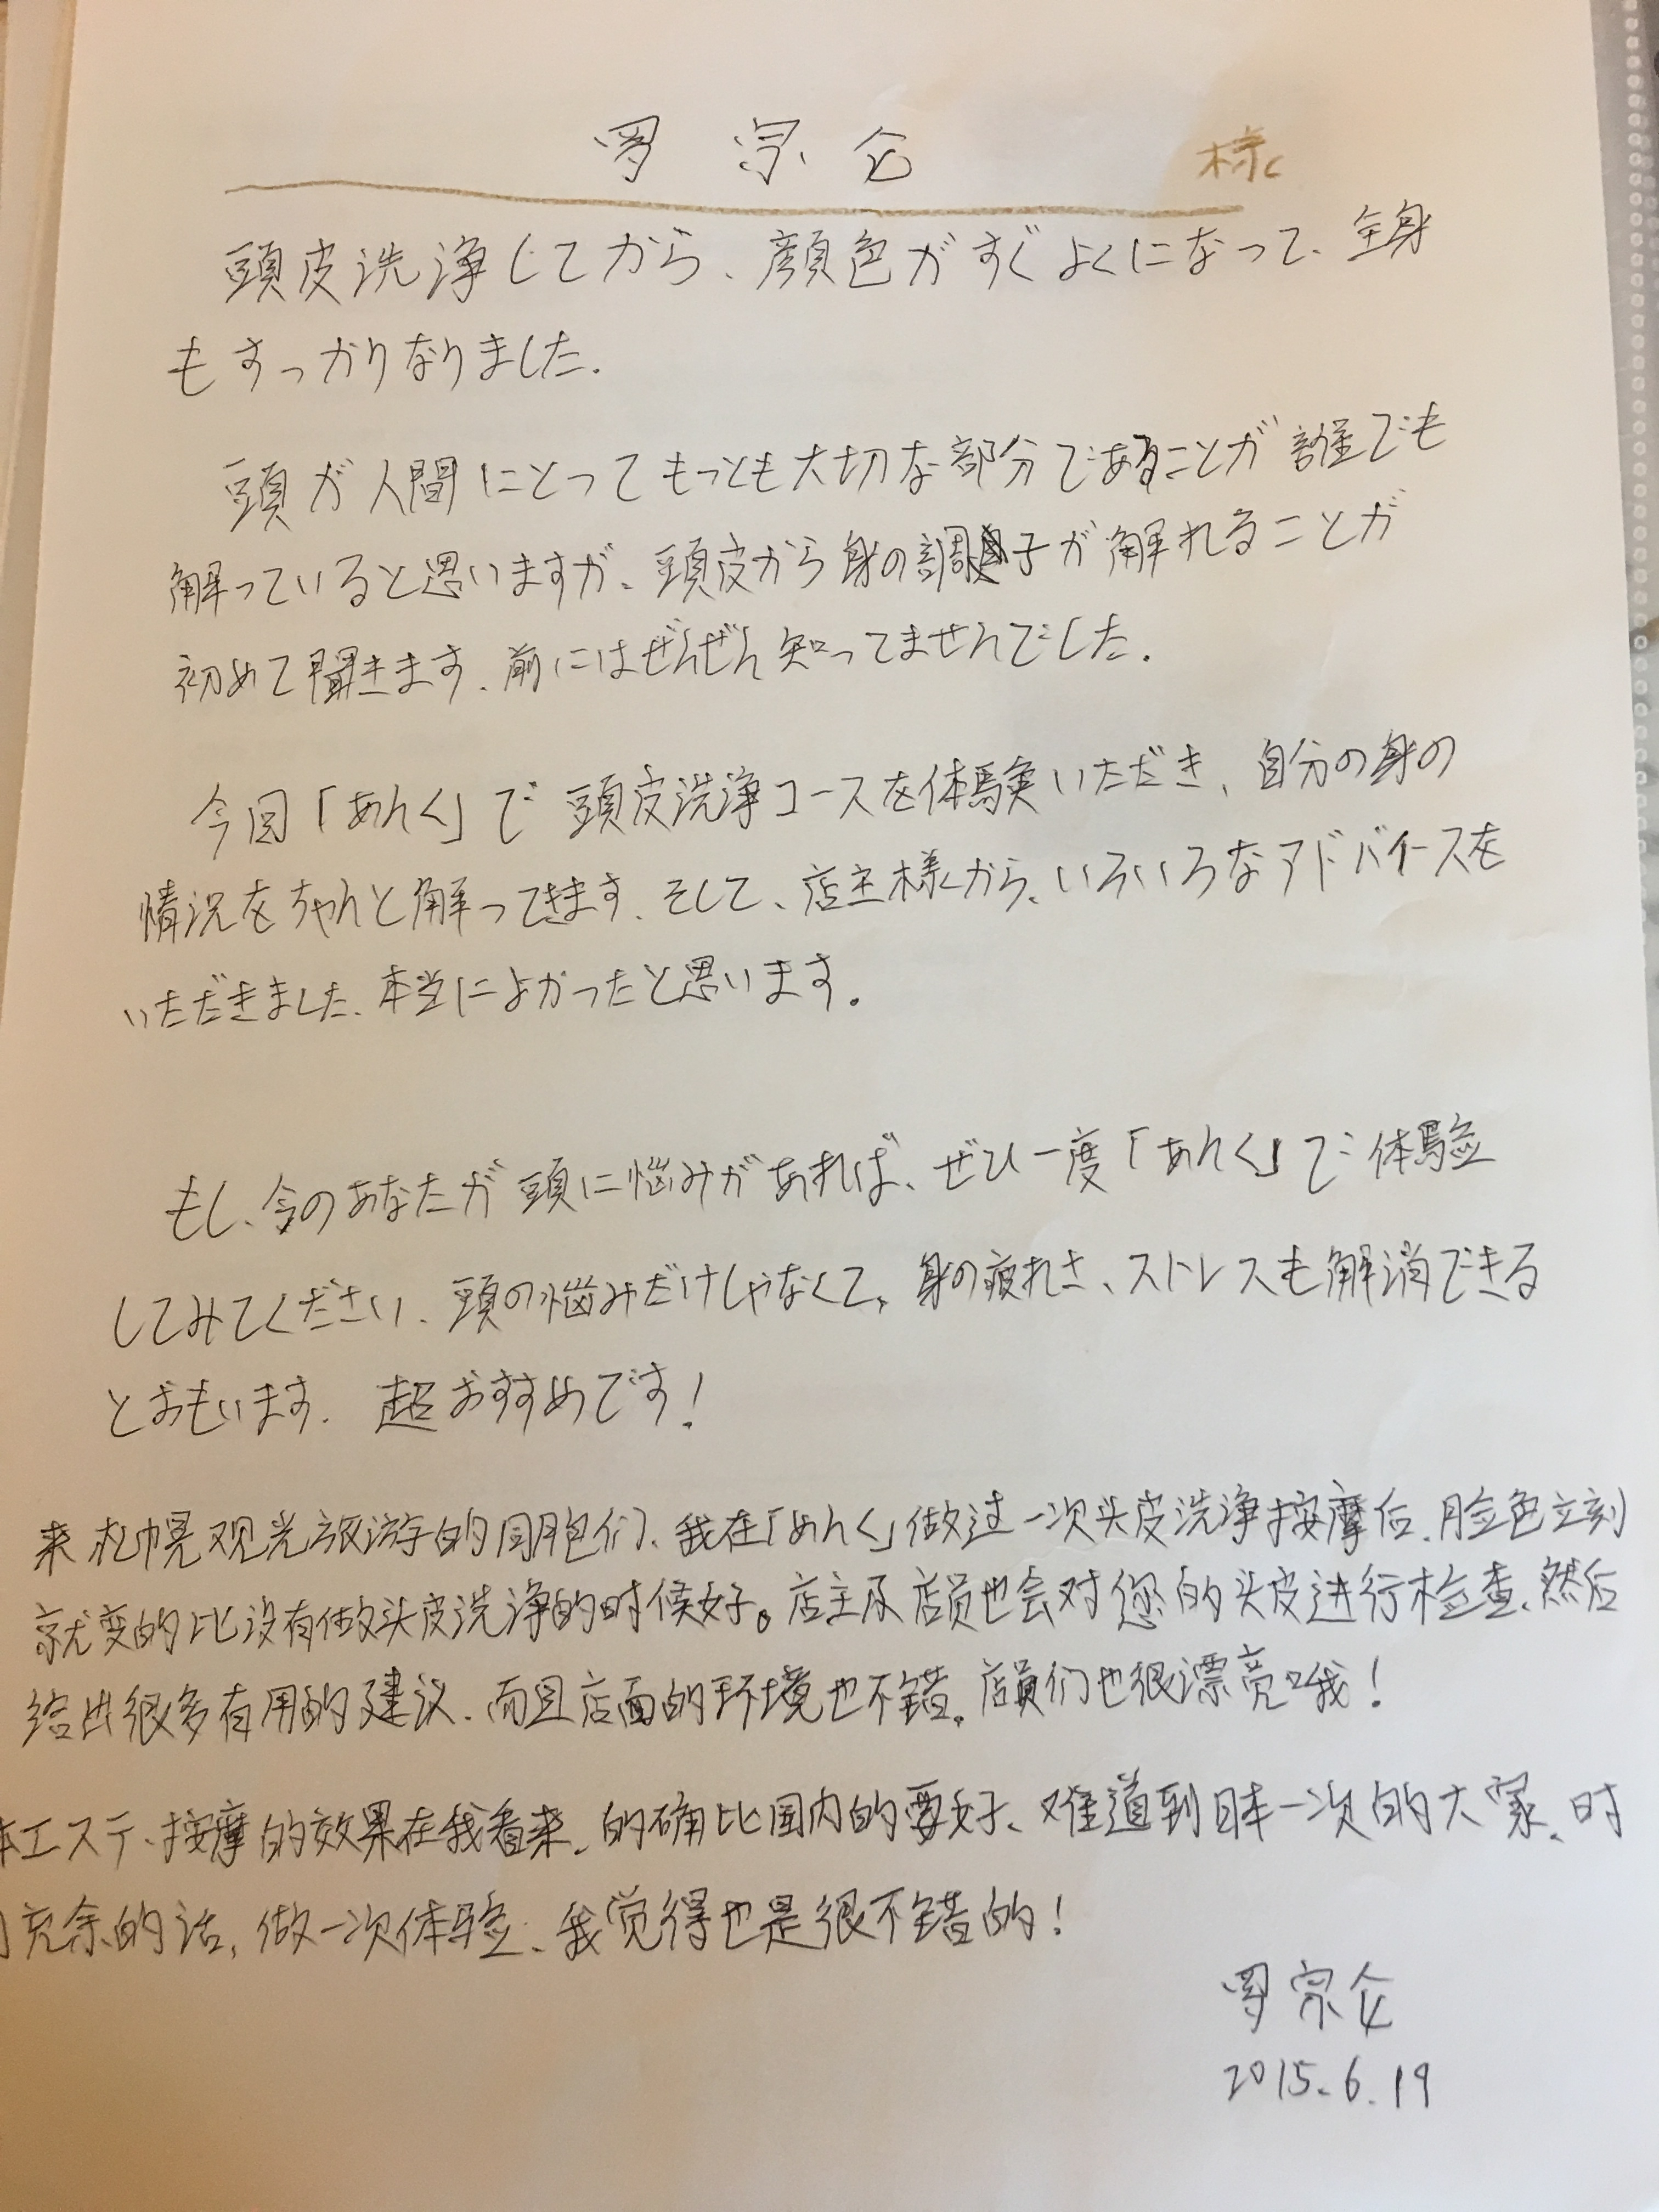 Customar's voice http://www.ankh-jp.com